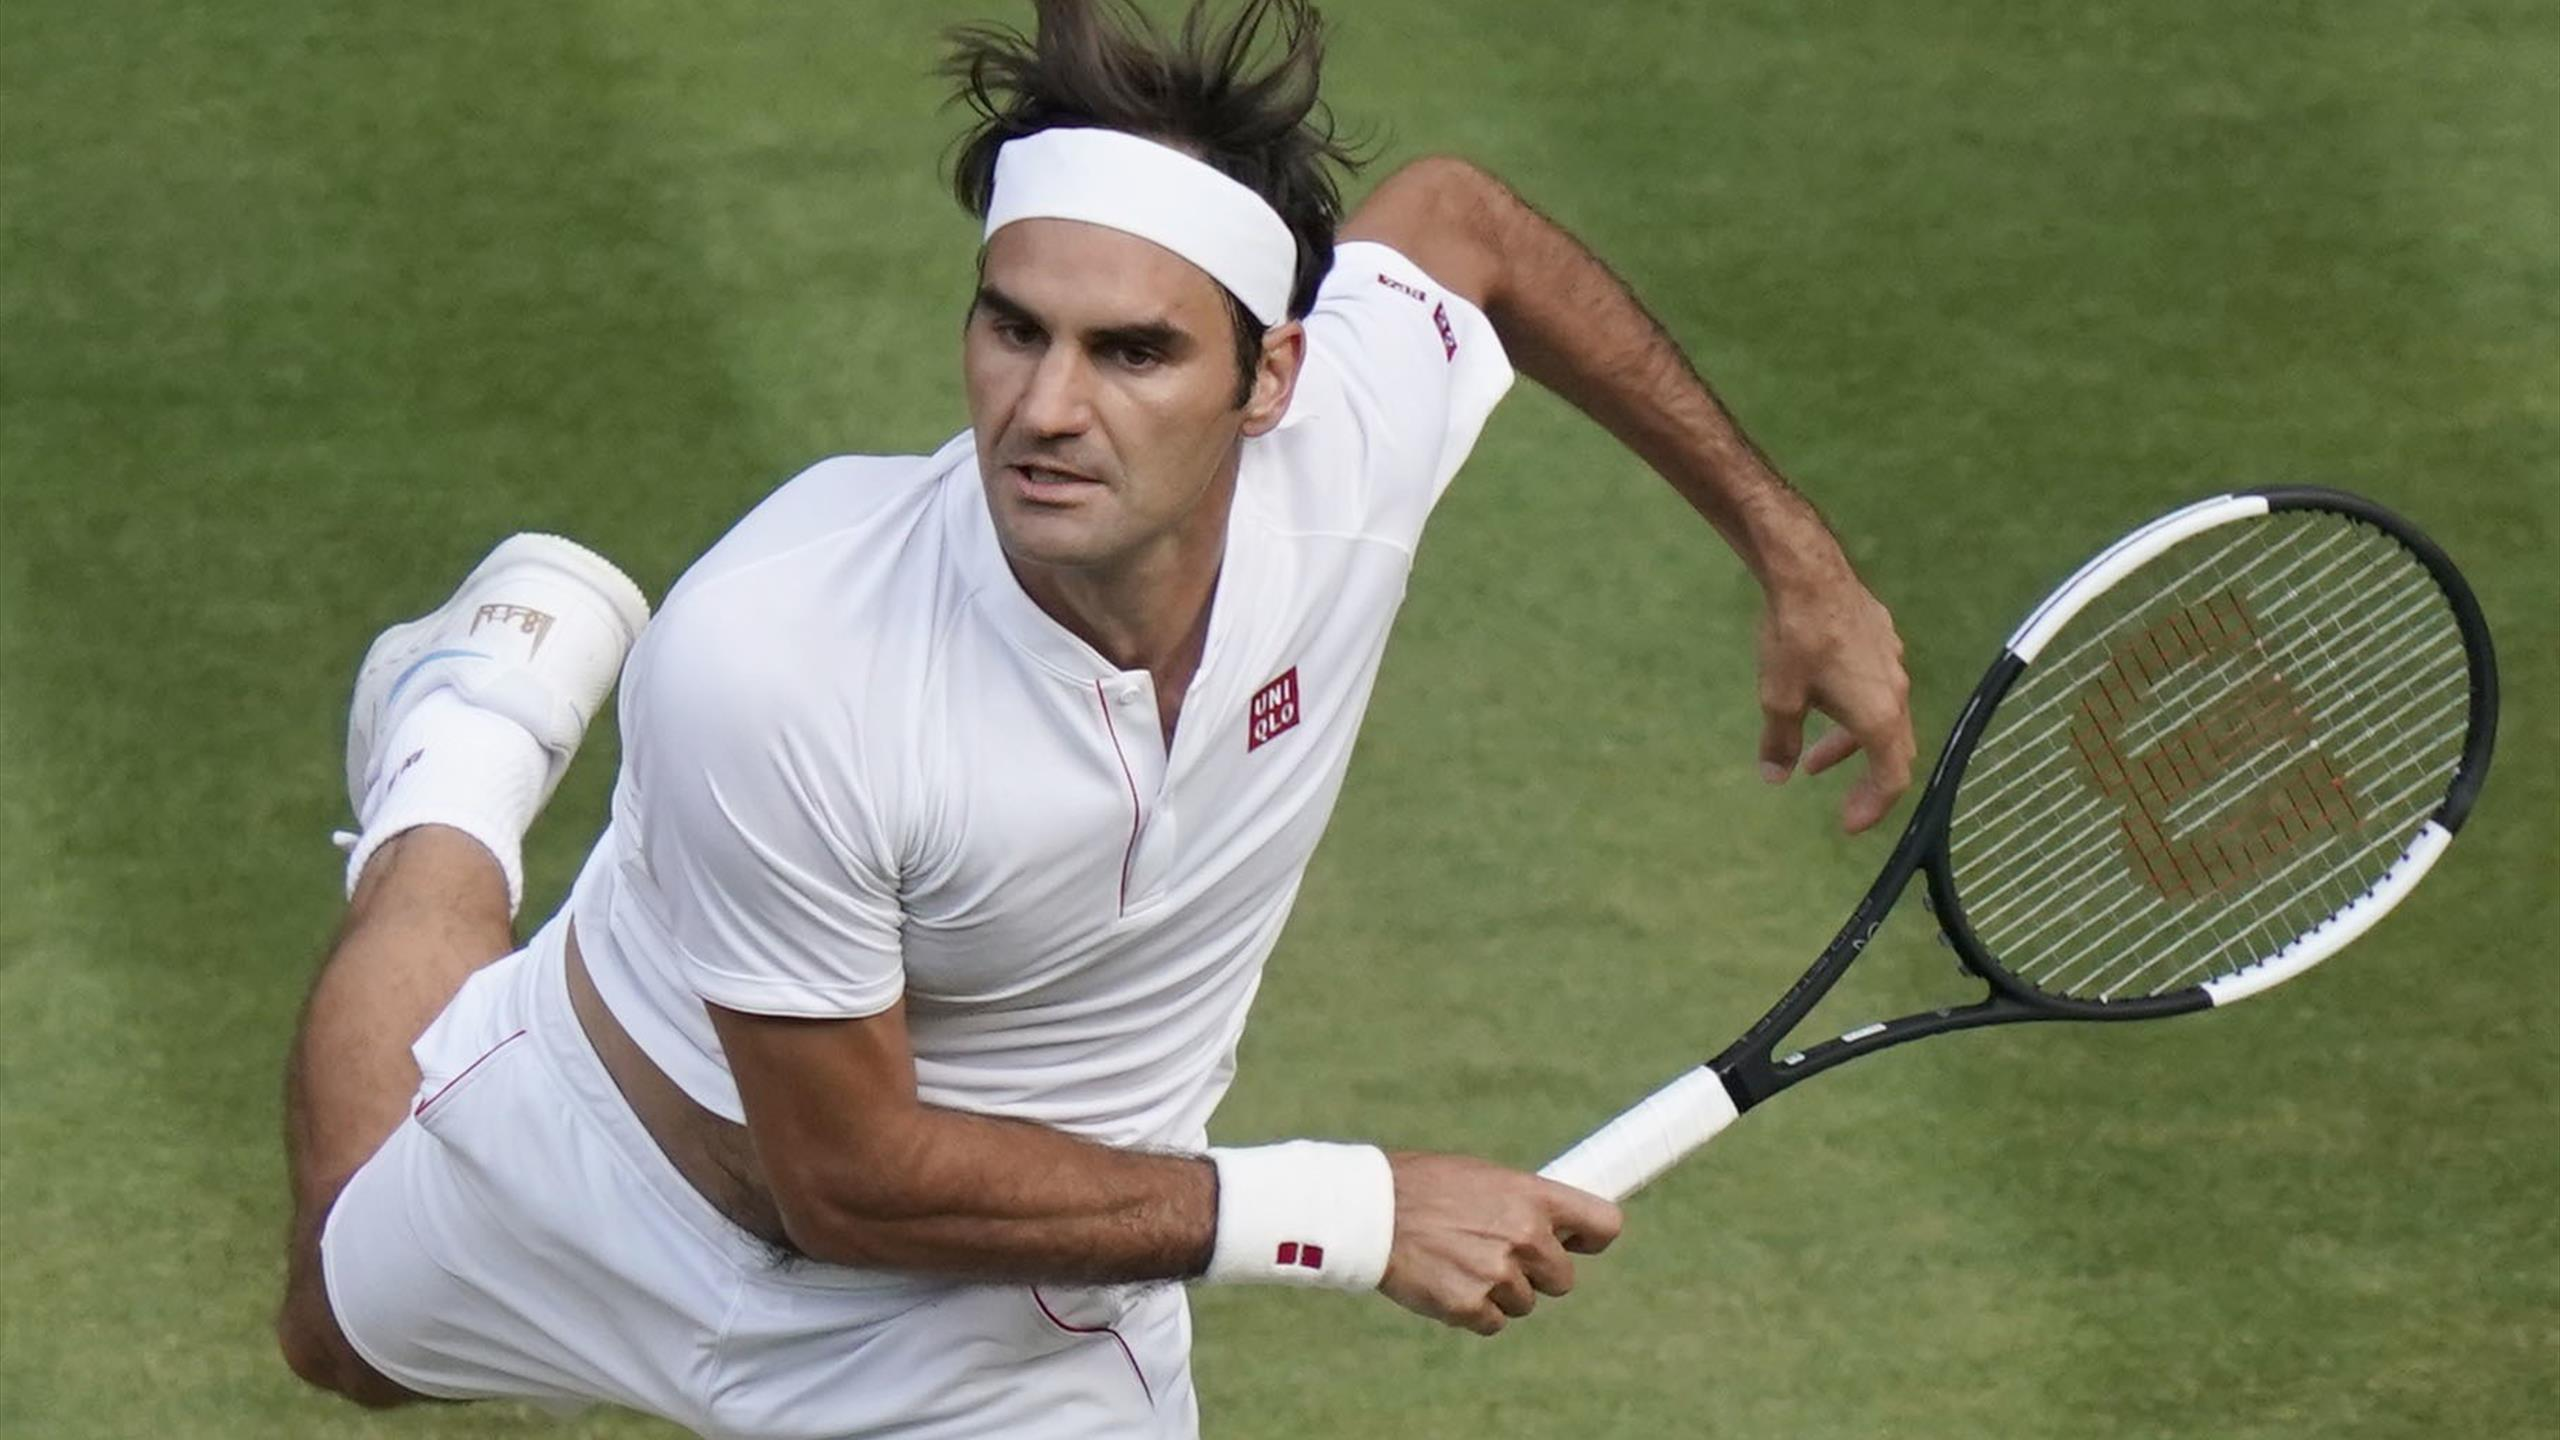 Wimbledon 2021 Tennis: Order of Play Day 2 –  Ashleigh Barty, Serena Williams, Roger Federer, Alexander Zverev in action